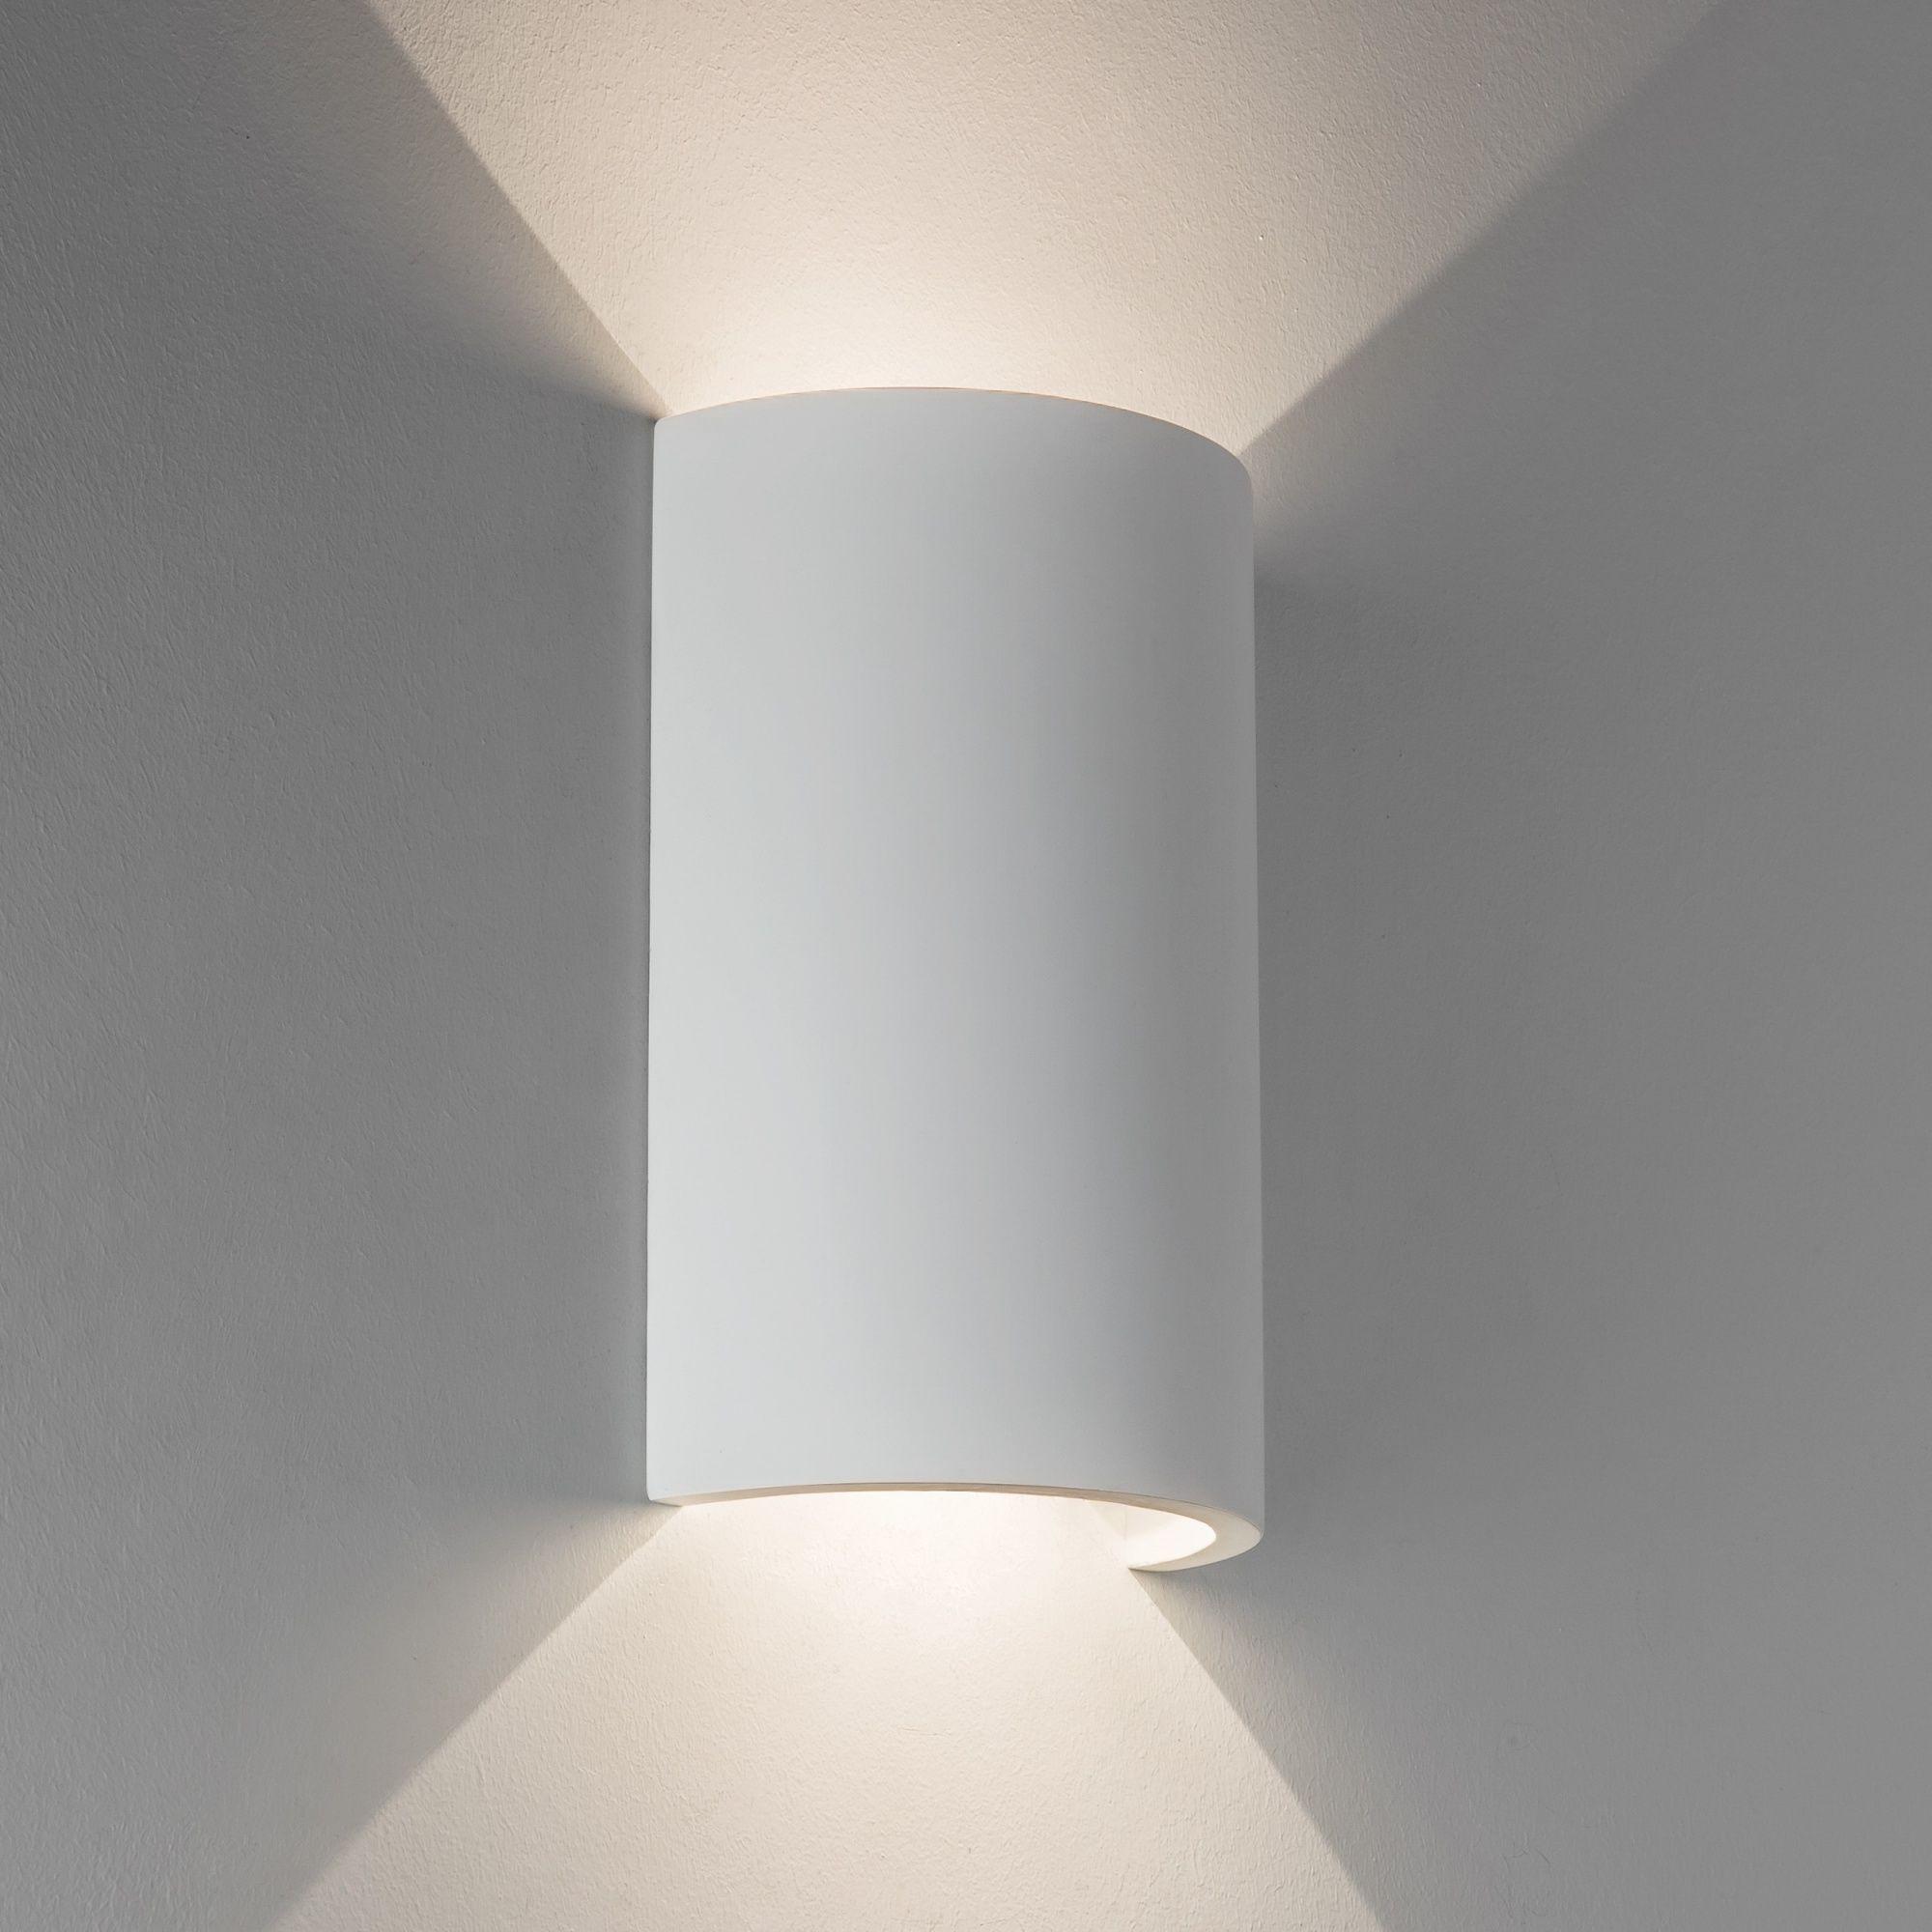 Kinkiet Serifos 170 7613 Astro Lighting